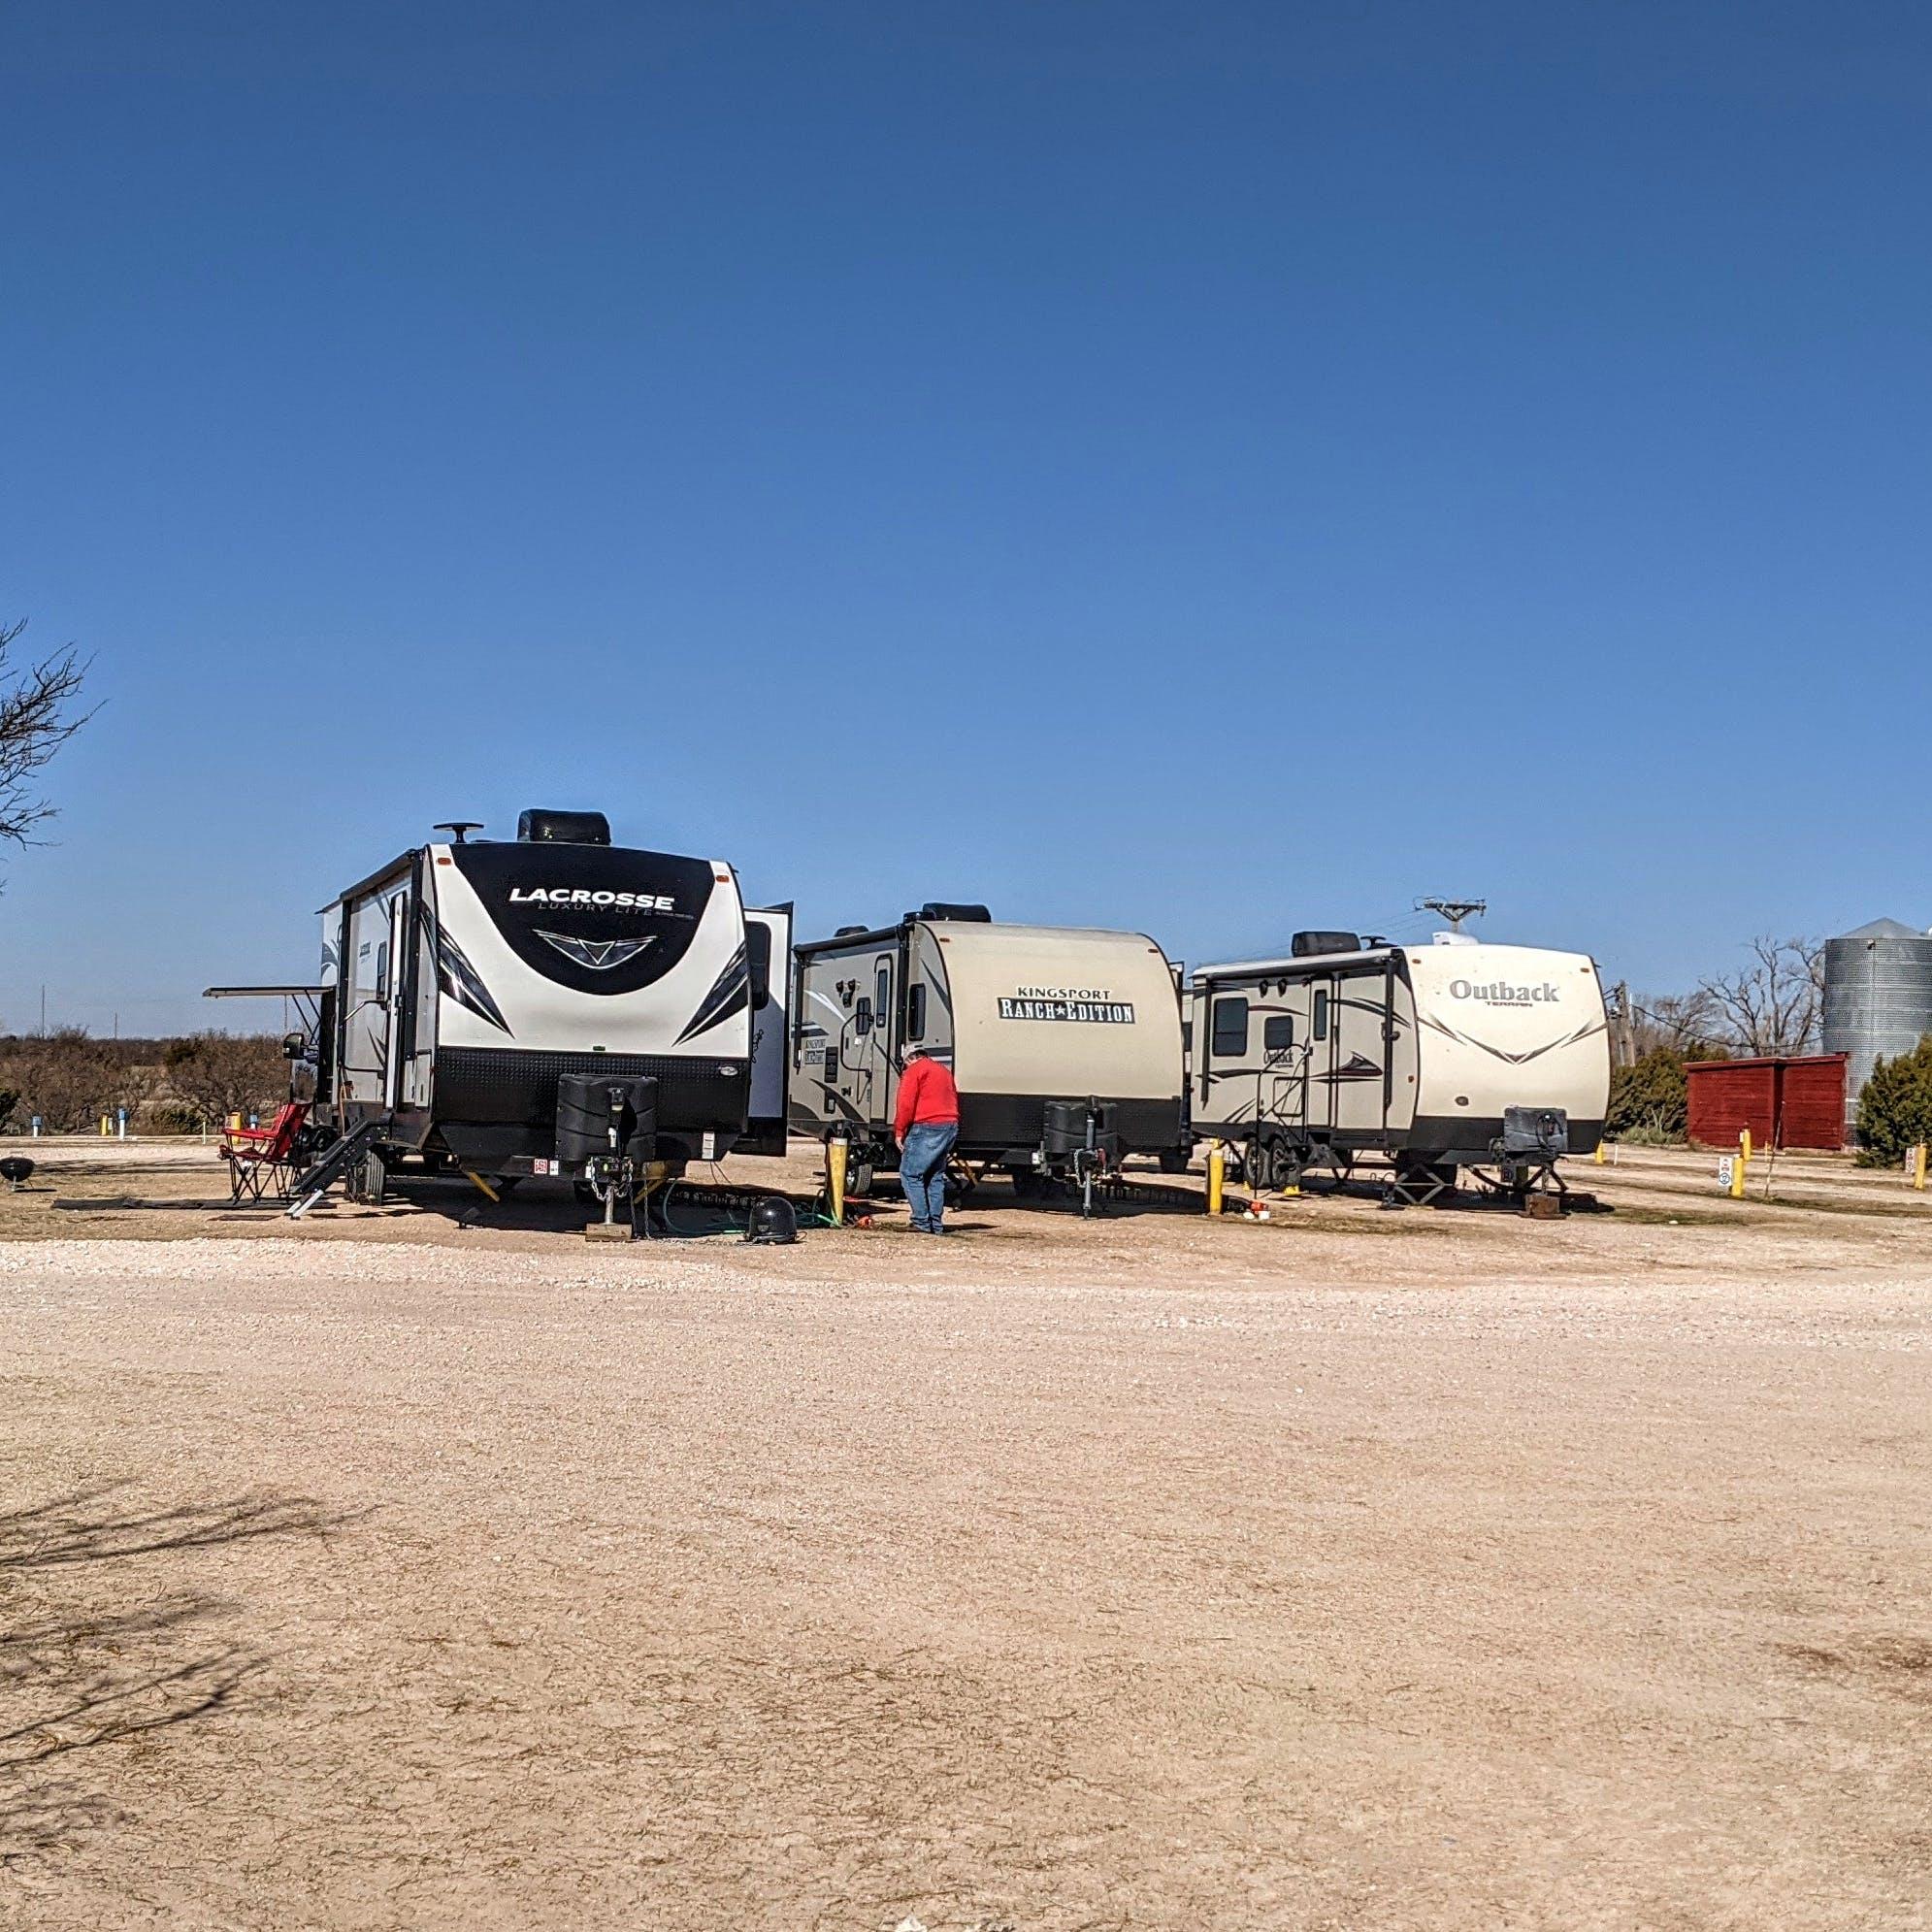 Palo Duro rv Campground, NM | The Dyrt